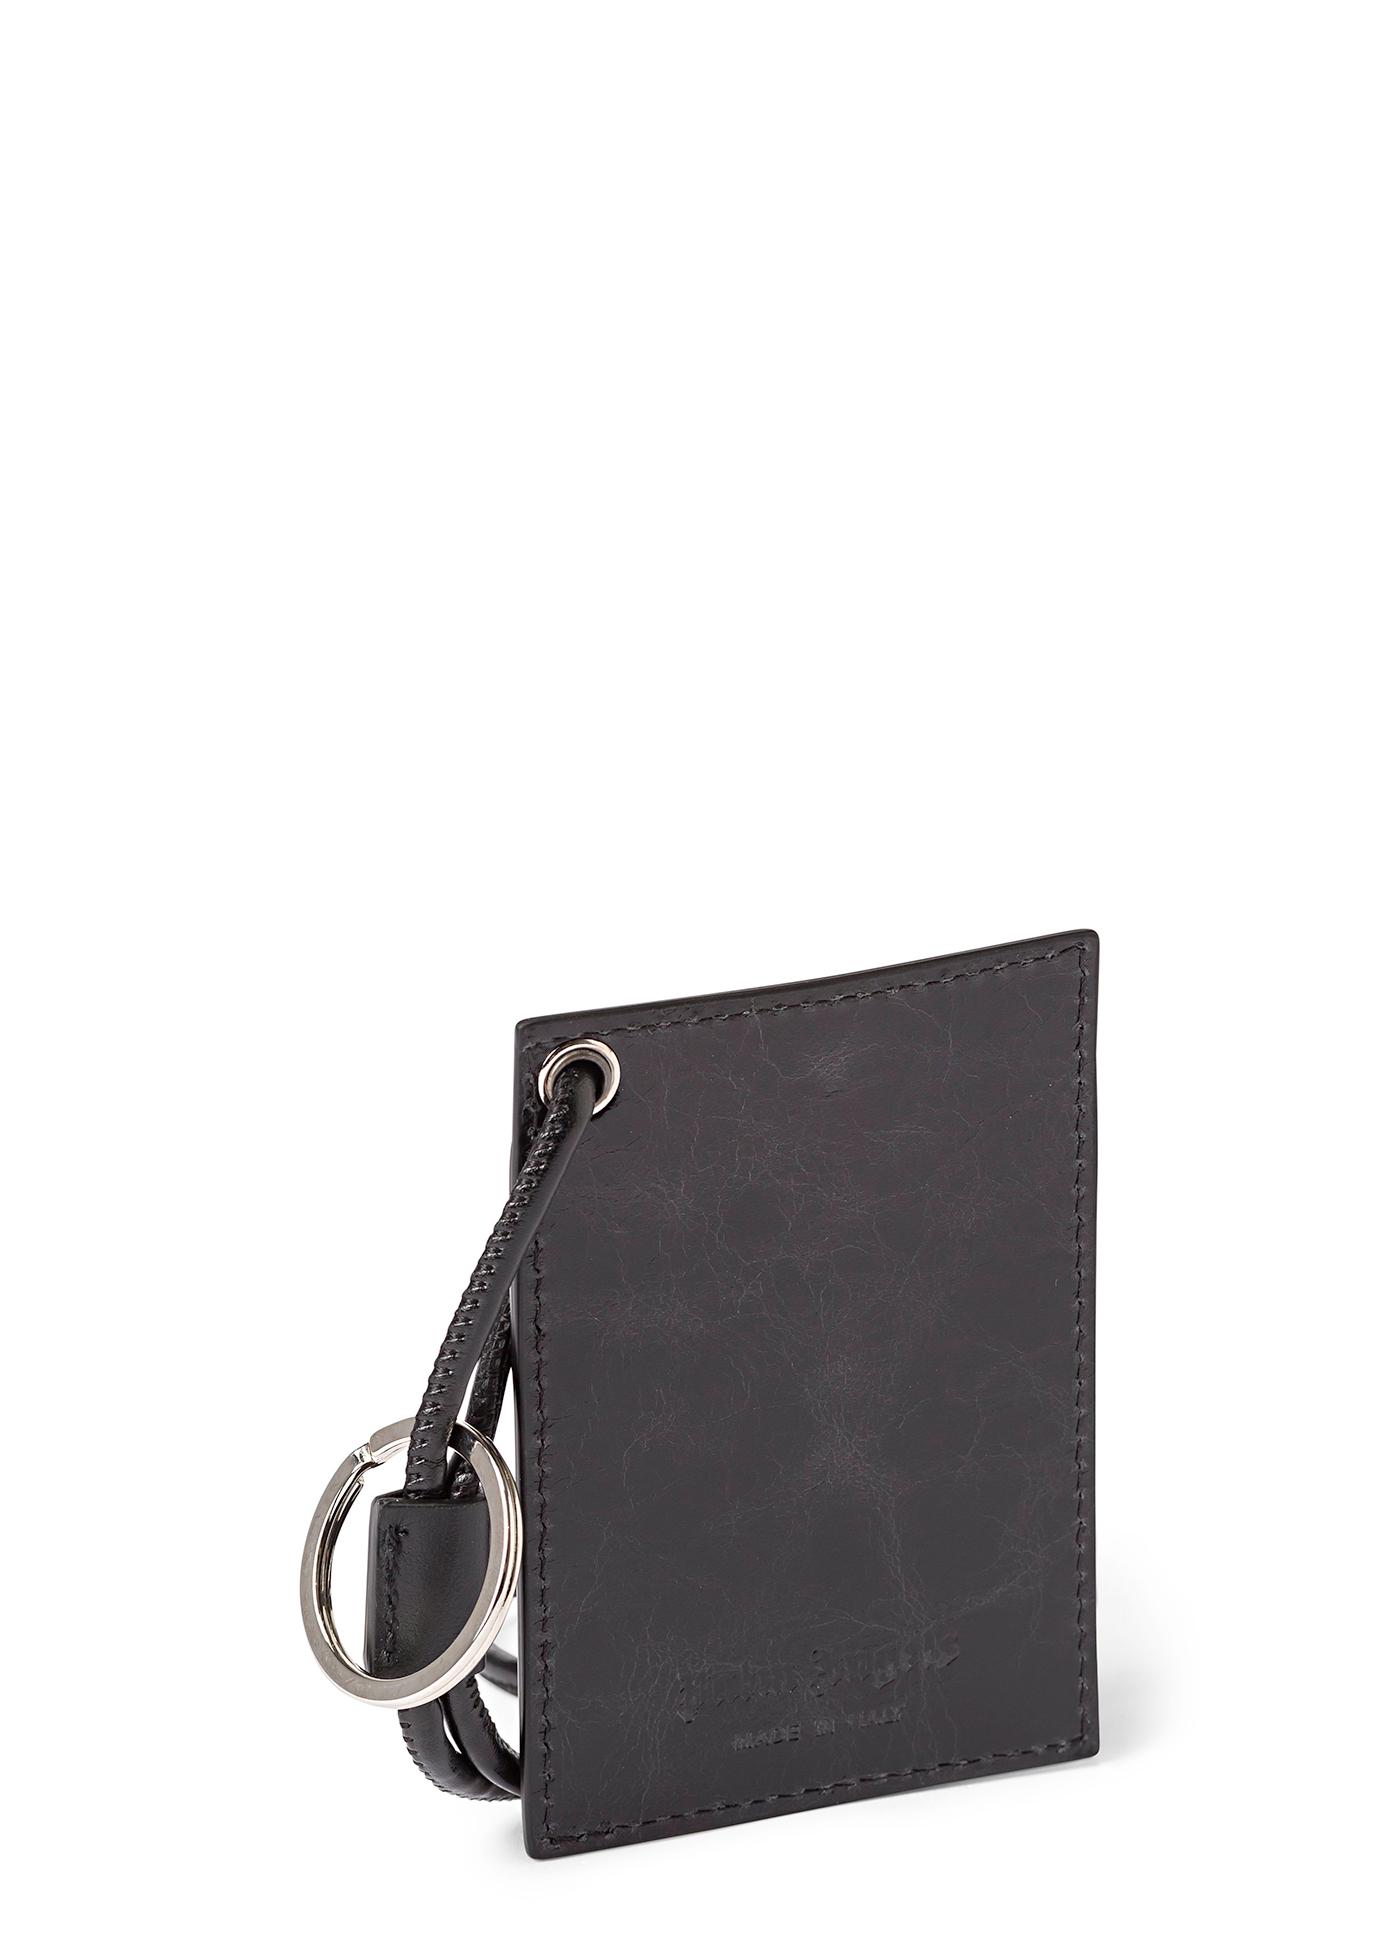 CRINKLE LEATHER NECKCARDHOLDE BLACK WHIT image number 1